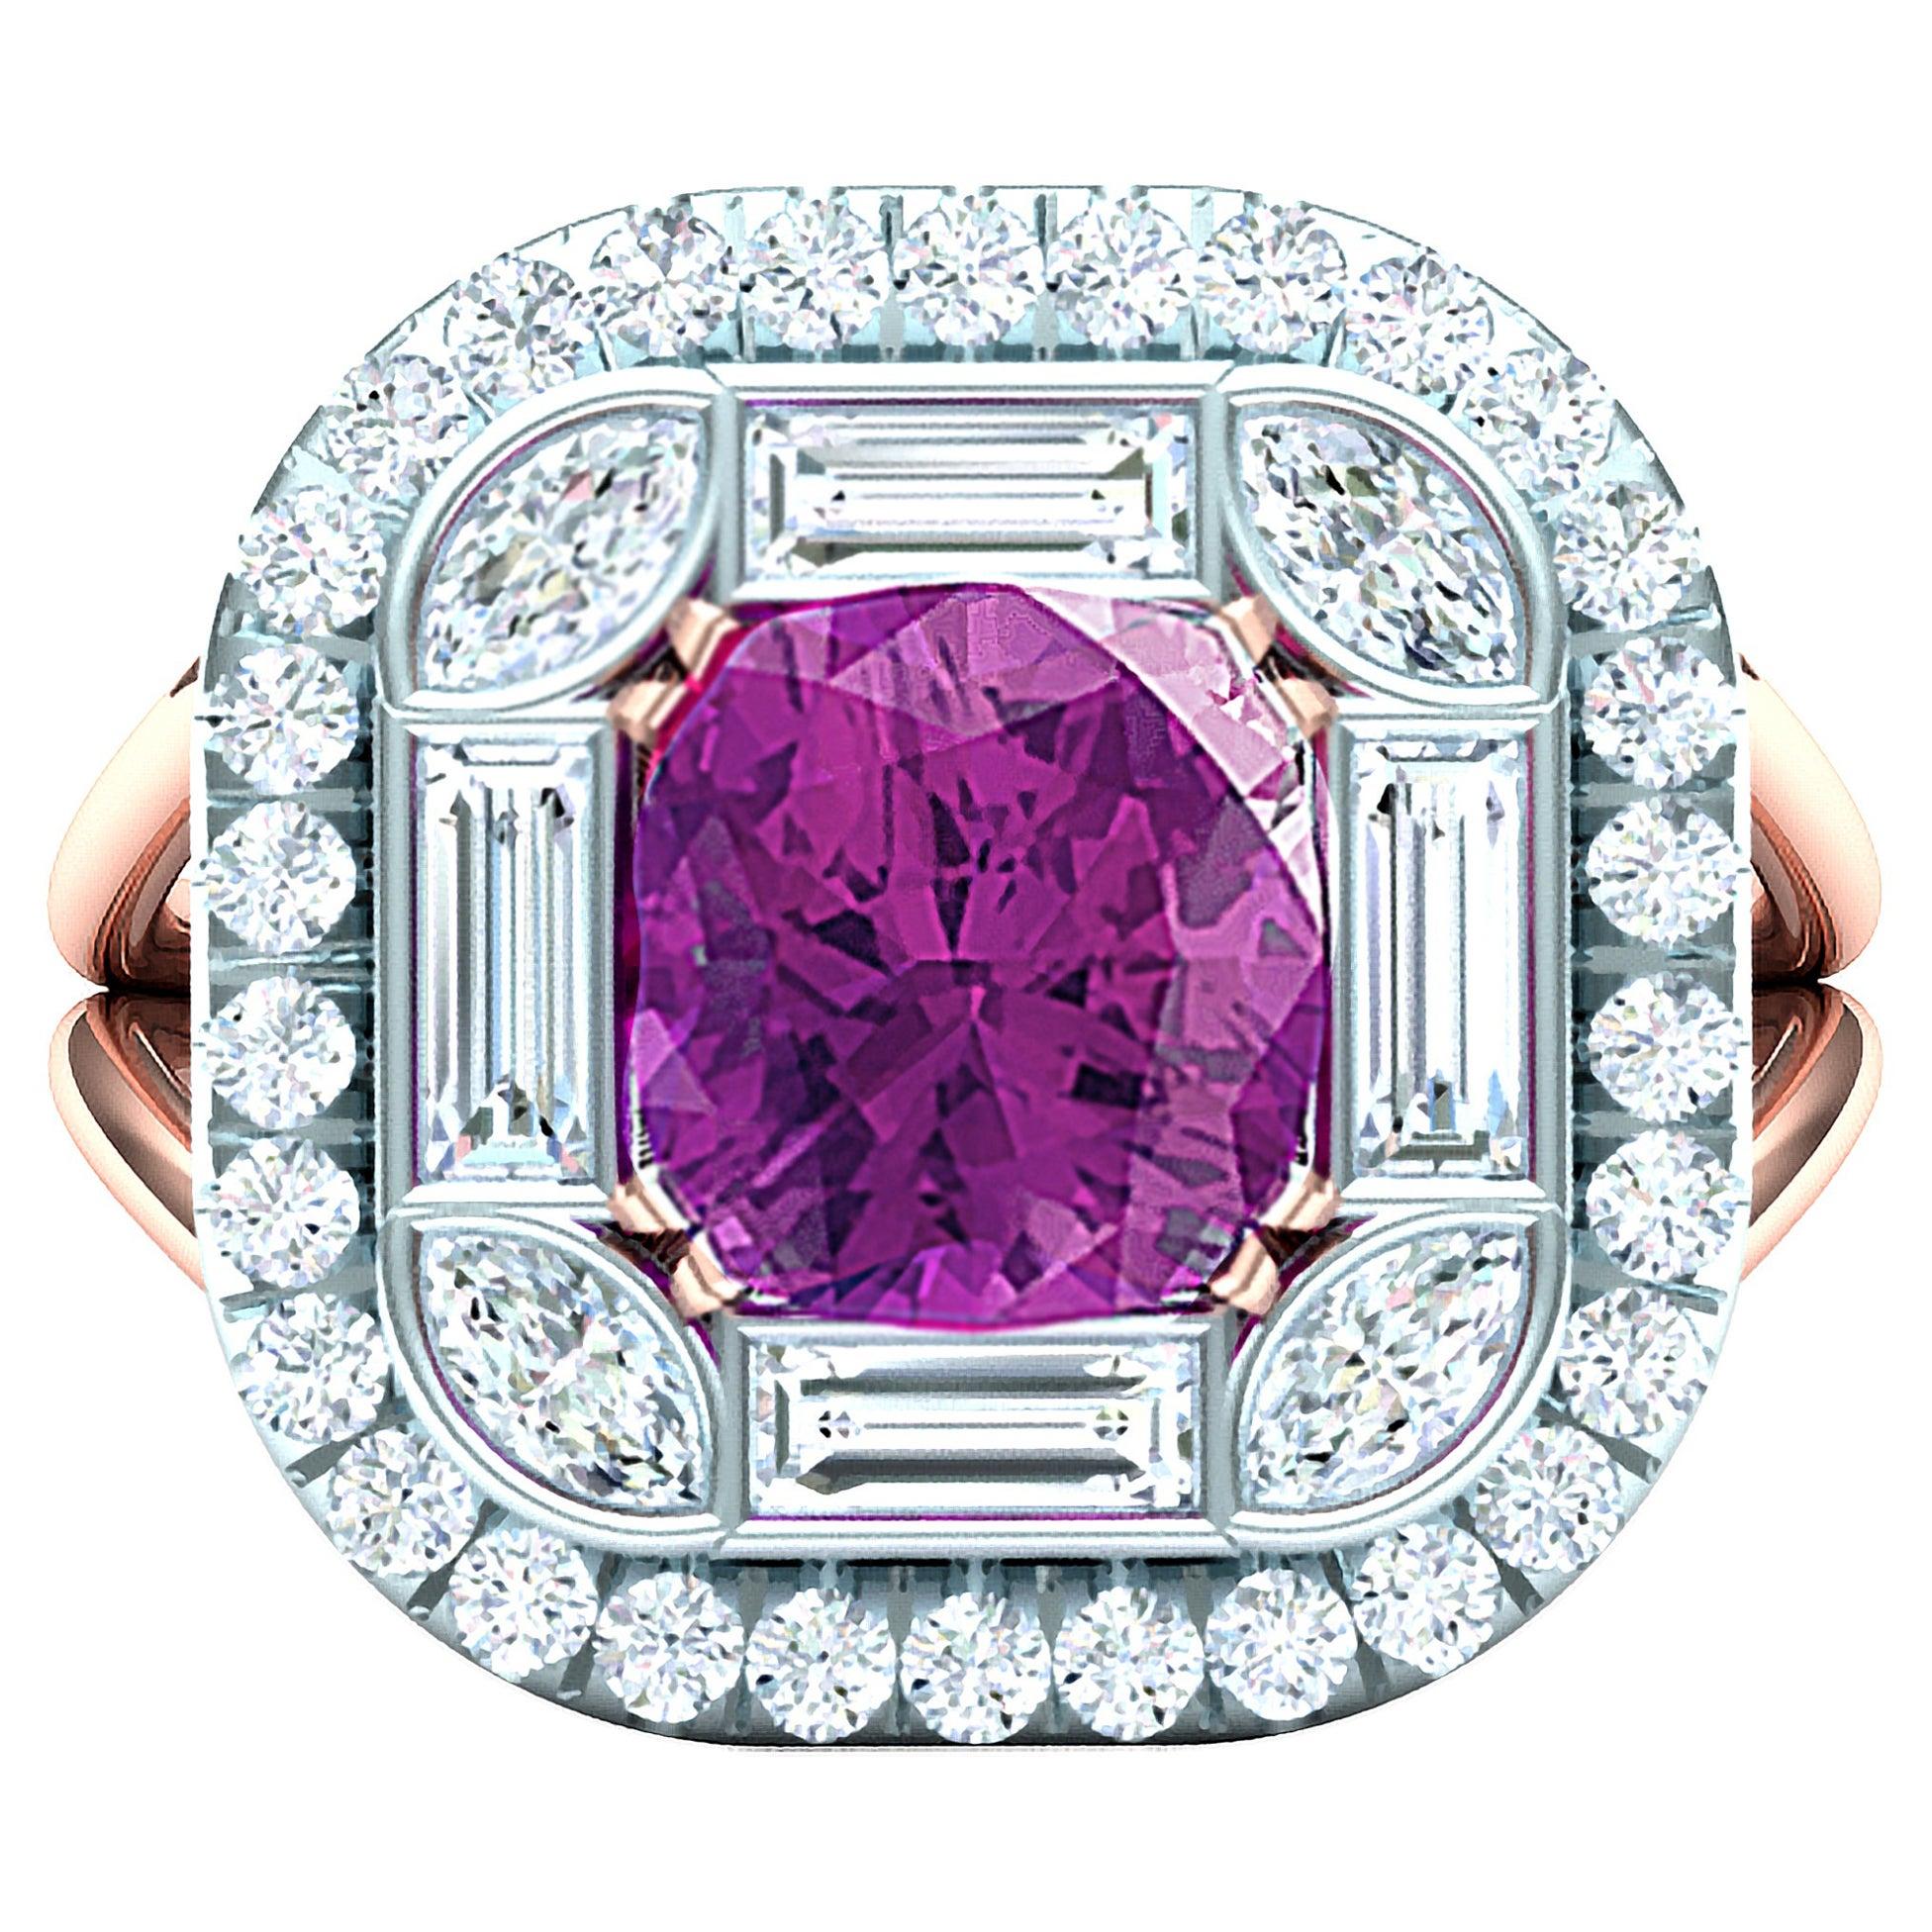 2 Carat Purplish Pink Cushion Cut Sapphire Diamond Cocktail Ring